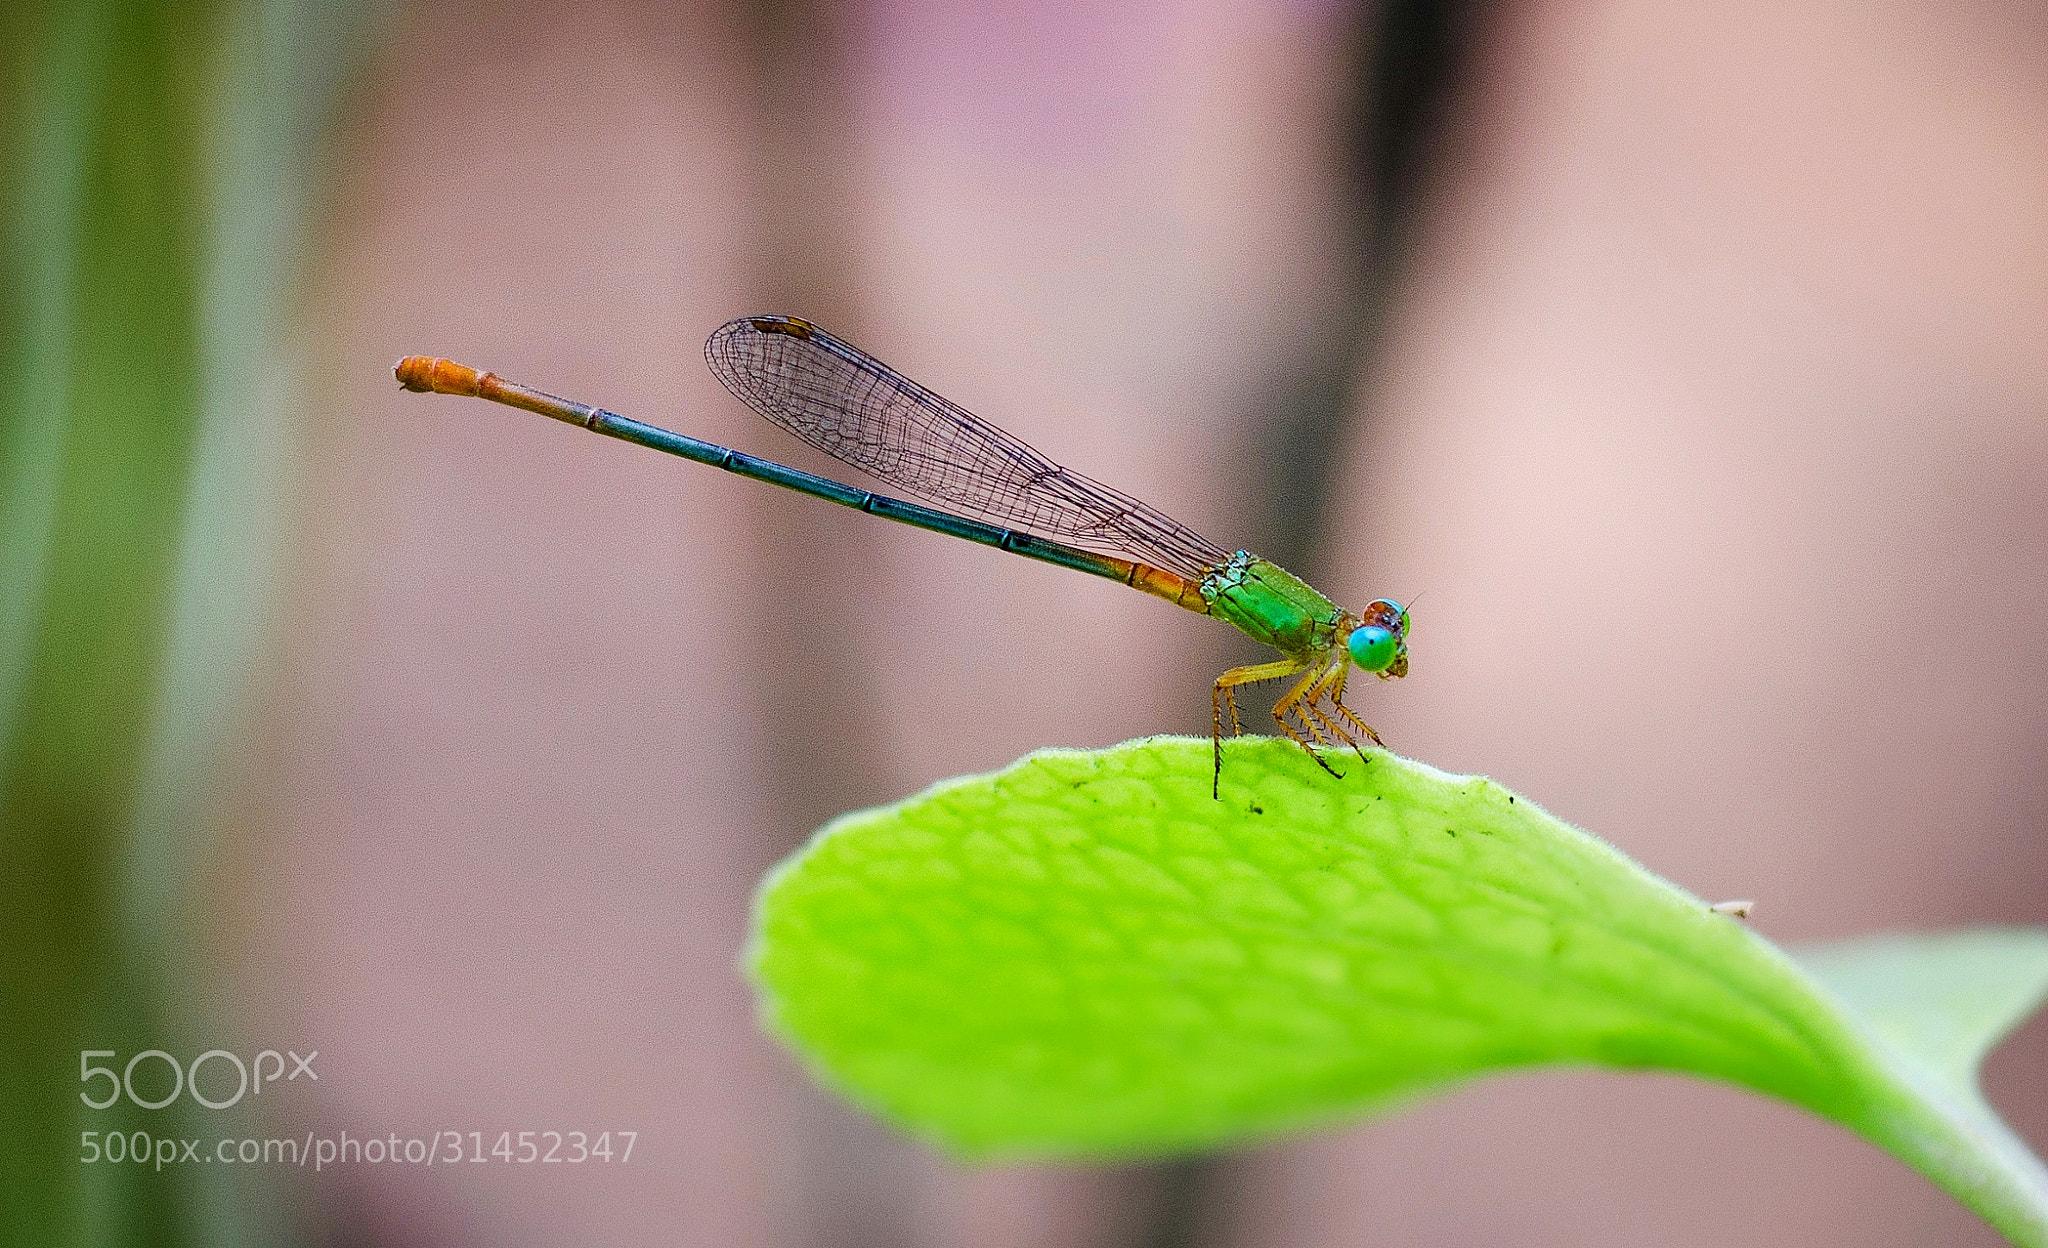 Photograph Damselfly by Subhash Radhakrishnan on 500px